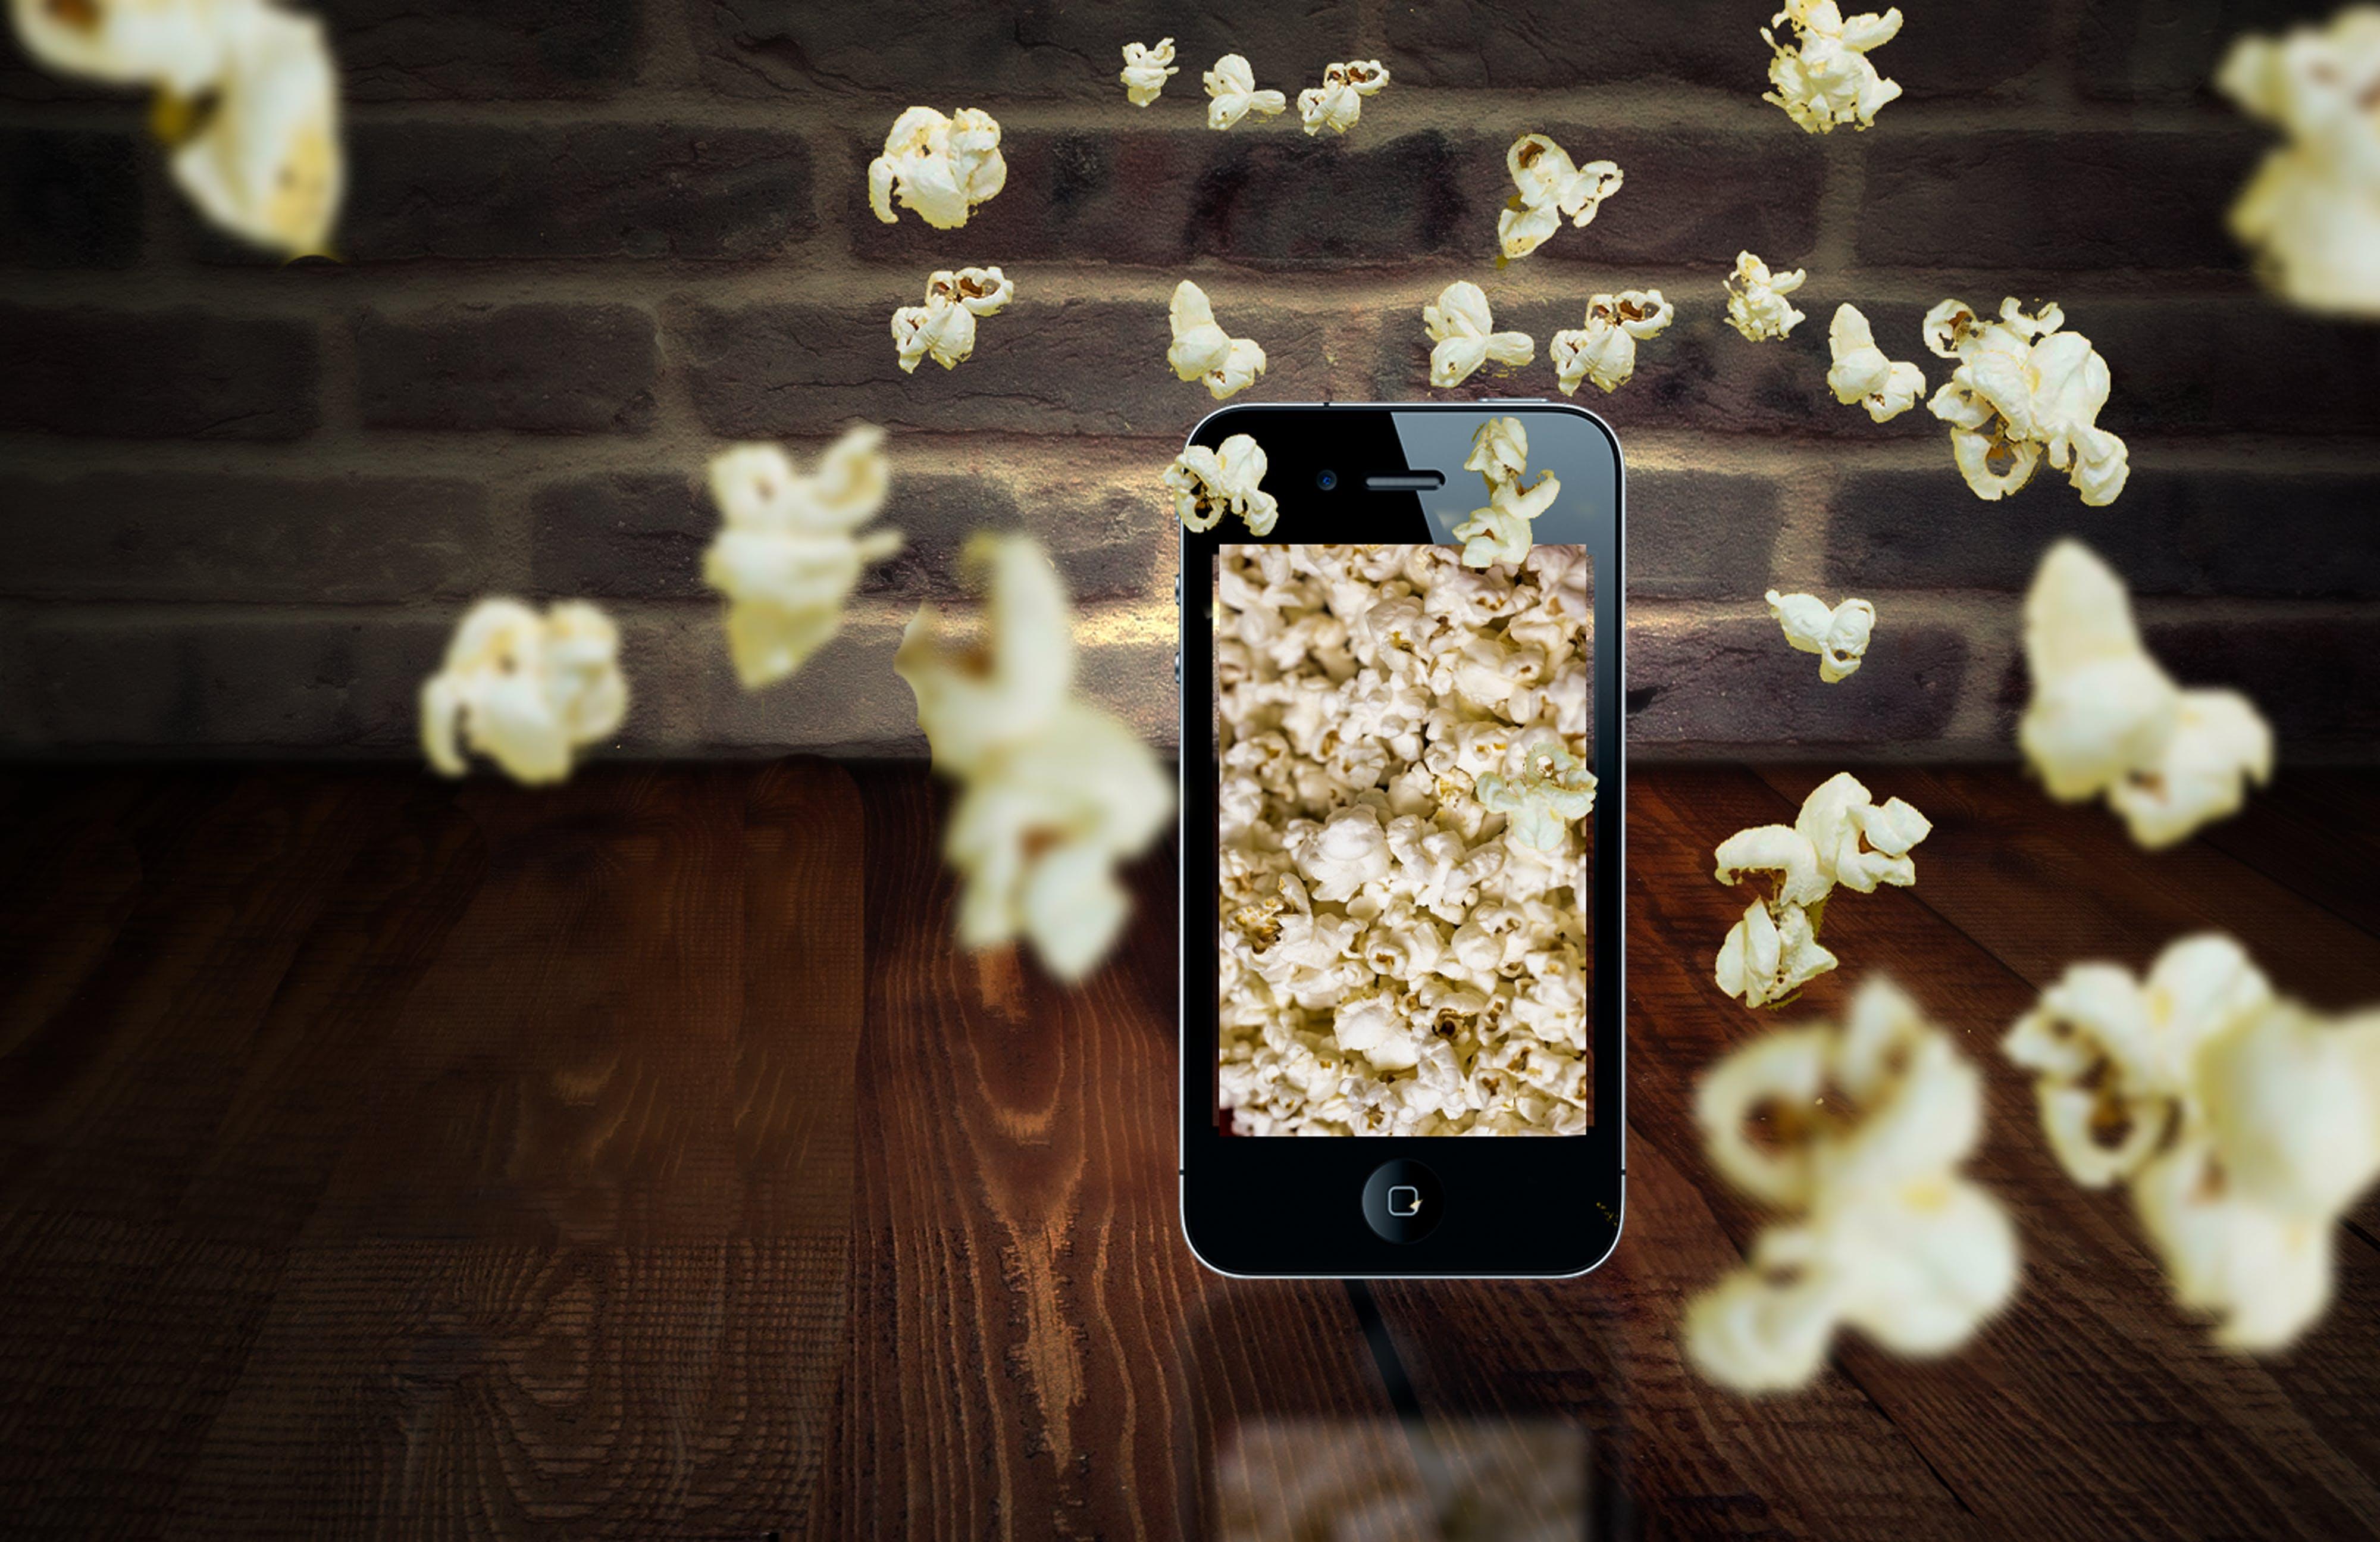 Kostenloses Stock Foto zu film, filme, fotobearbeitung, handy